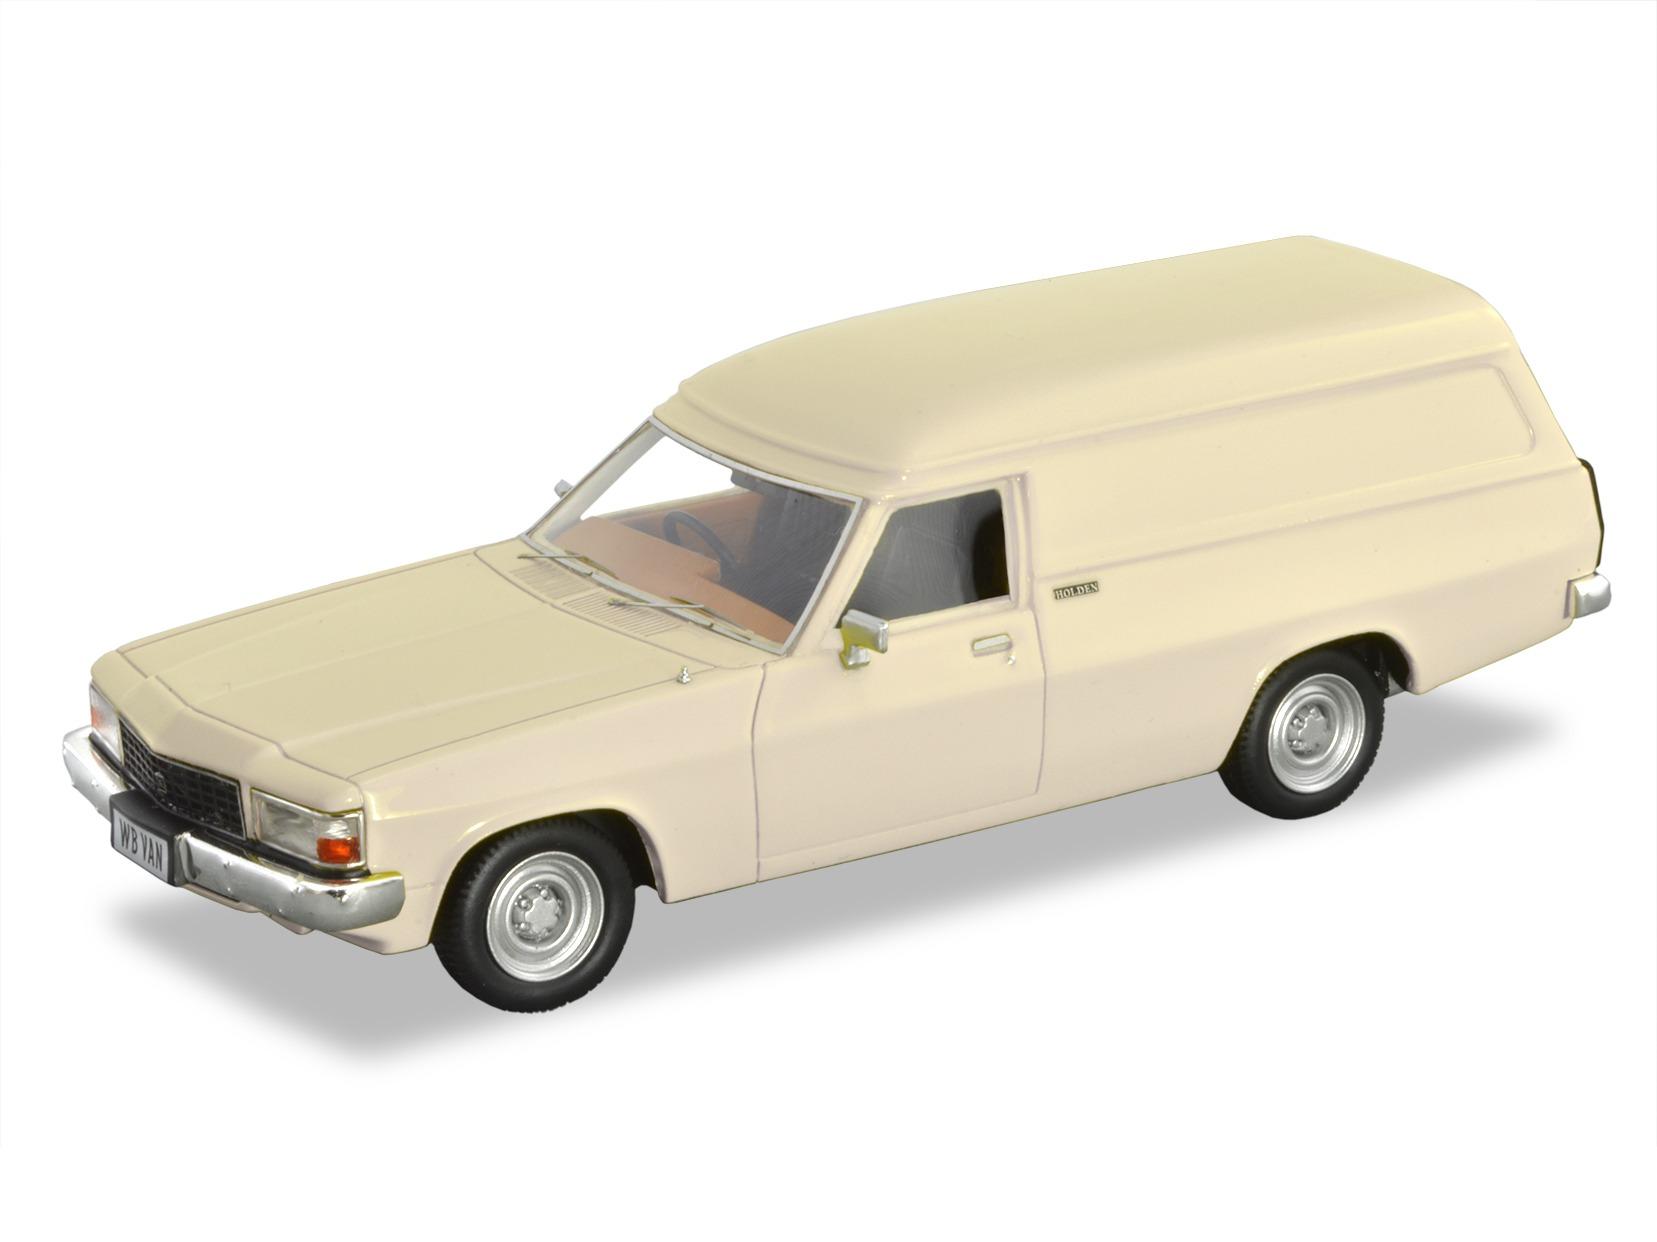 1982 Holden WB Panel Van – Torquay Sand